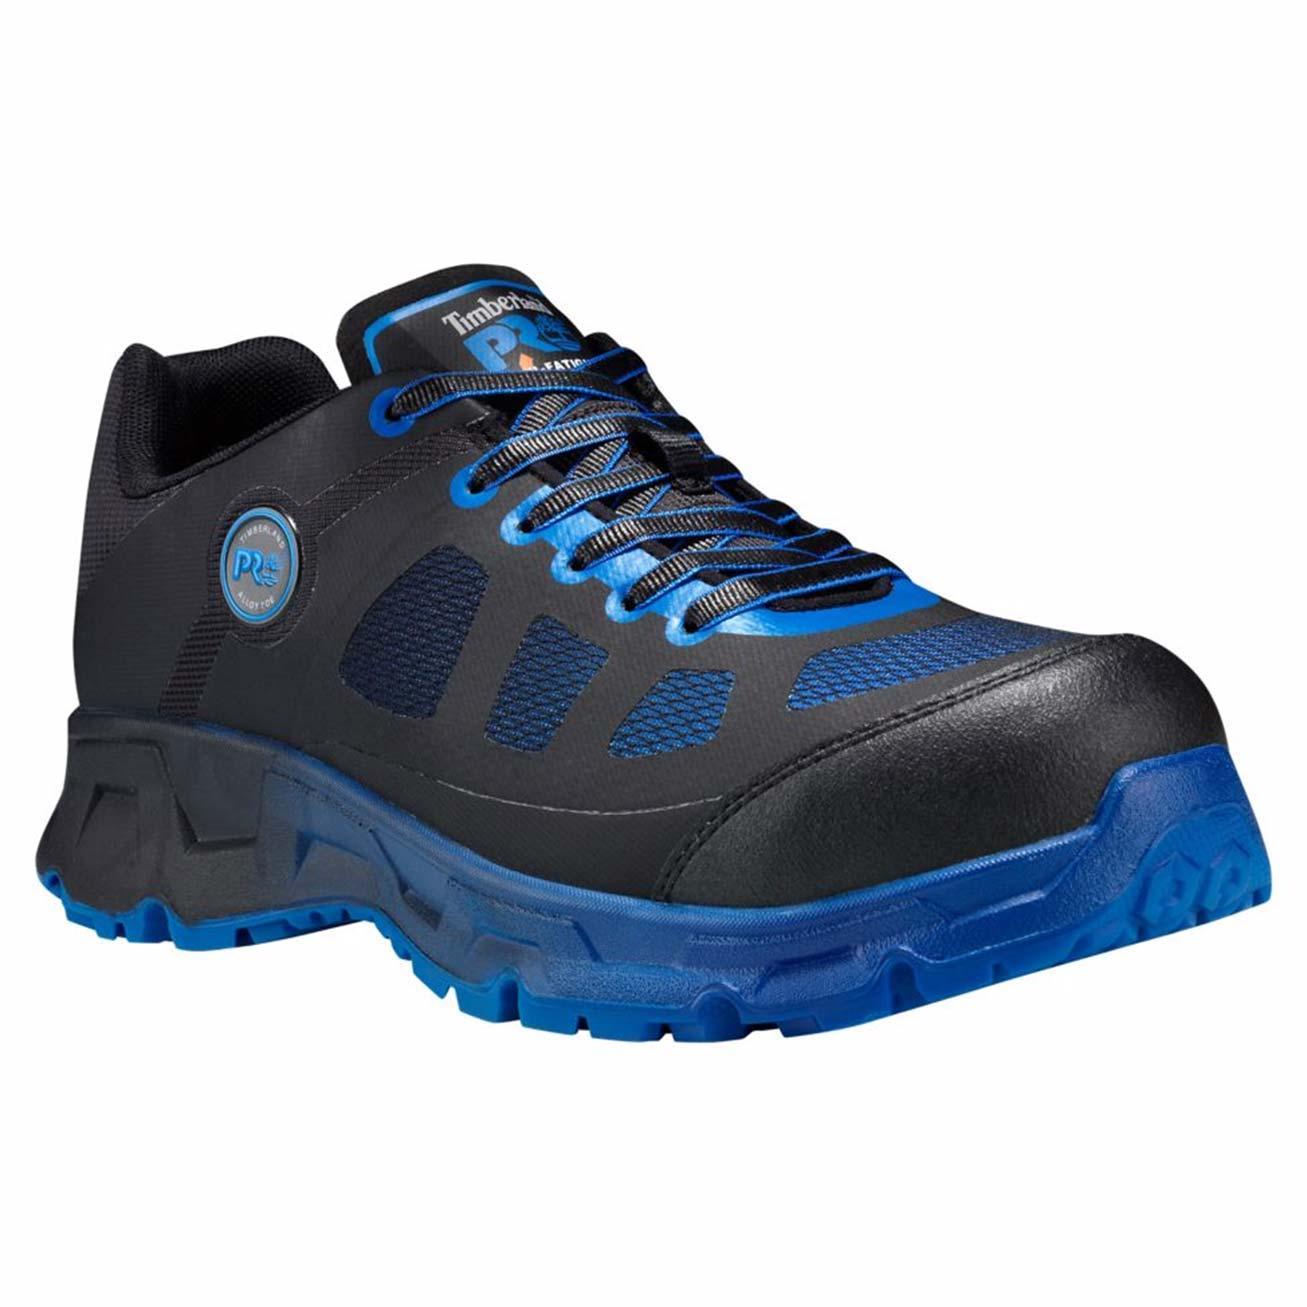 Timberland Pro Velocity Alloy Toe Static Dissipative Work Shoe